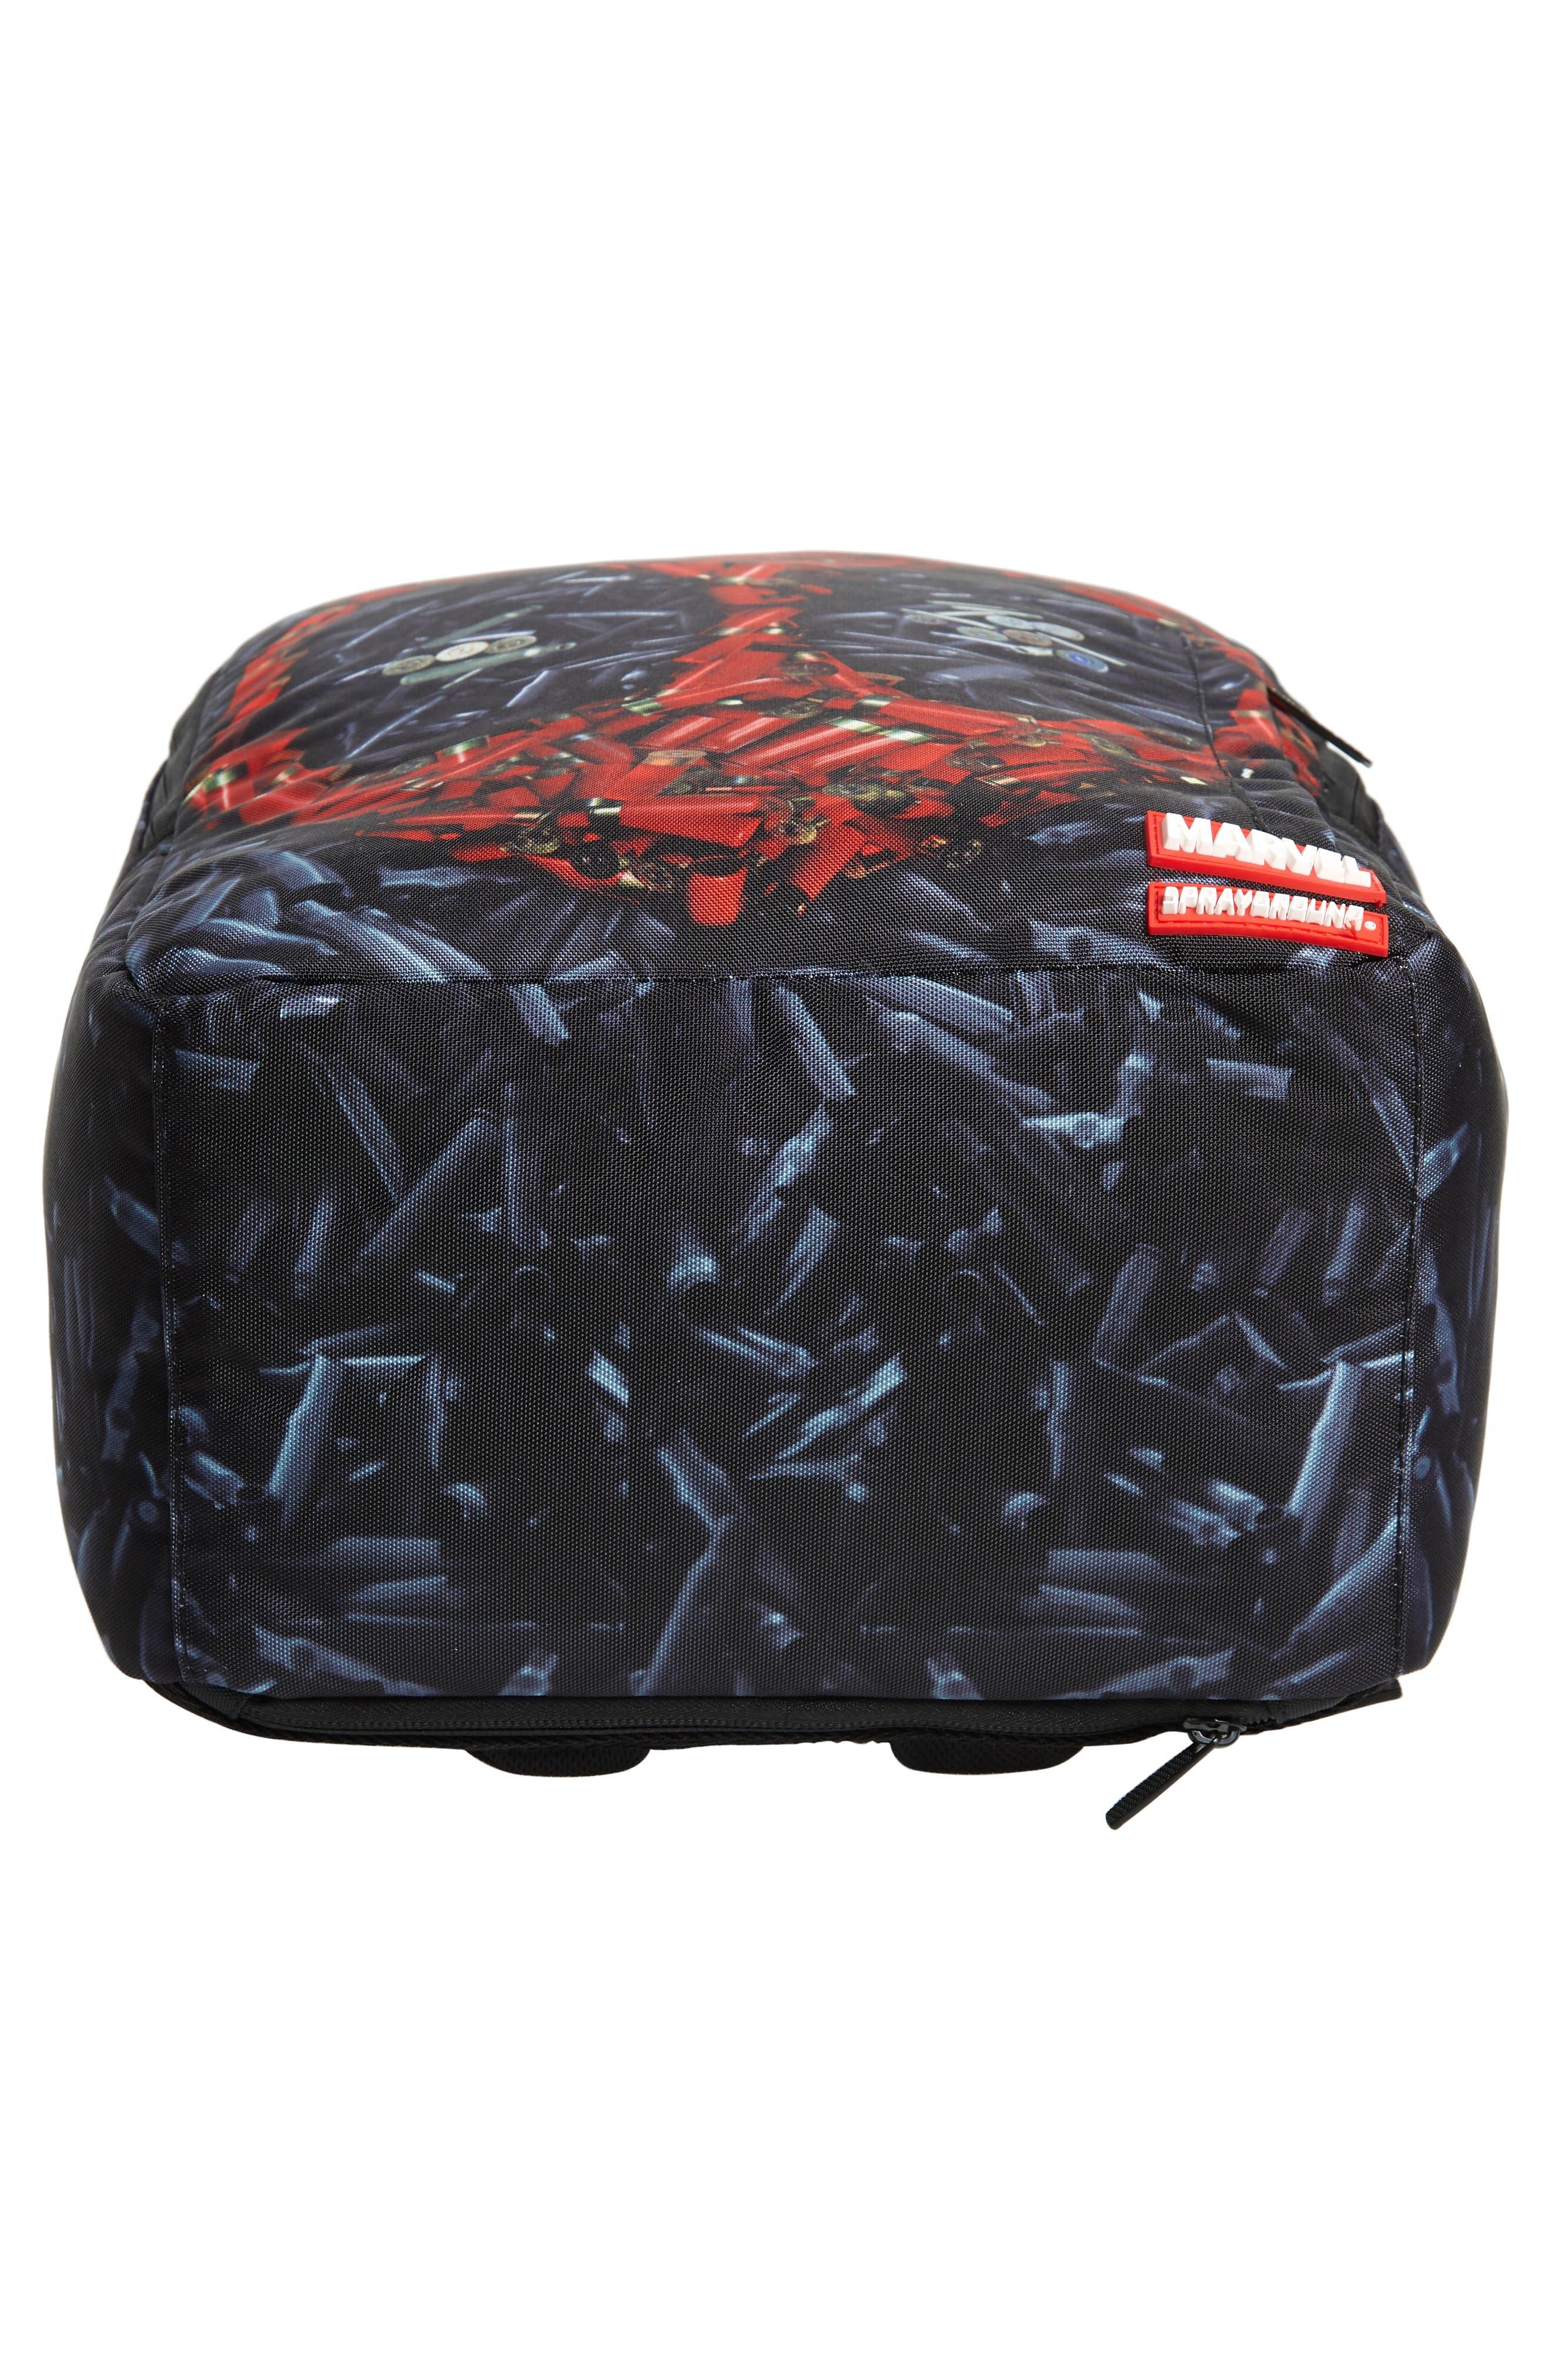 Deadpool Bullets Backpack,                             Alternate thumbnail 6, color,                             001